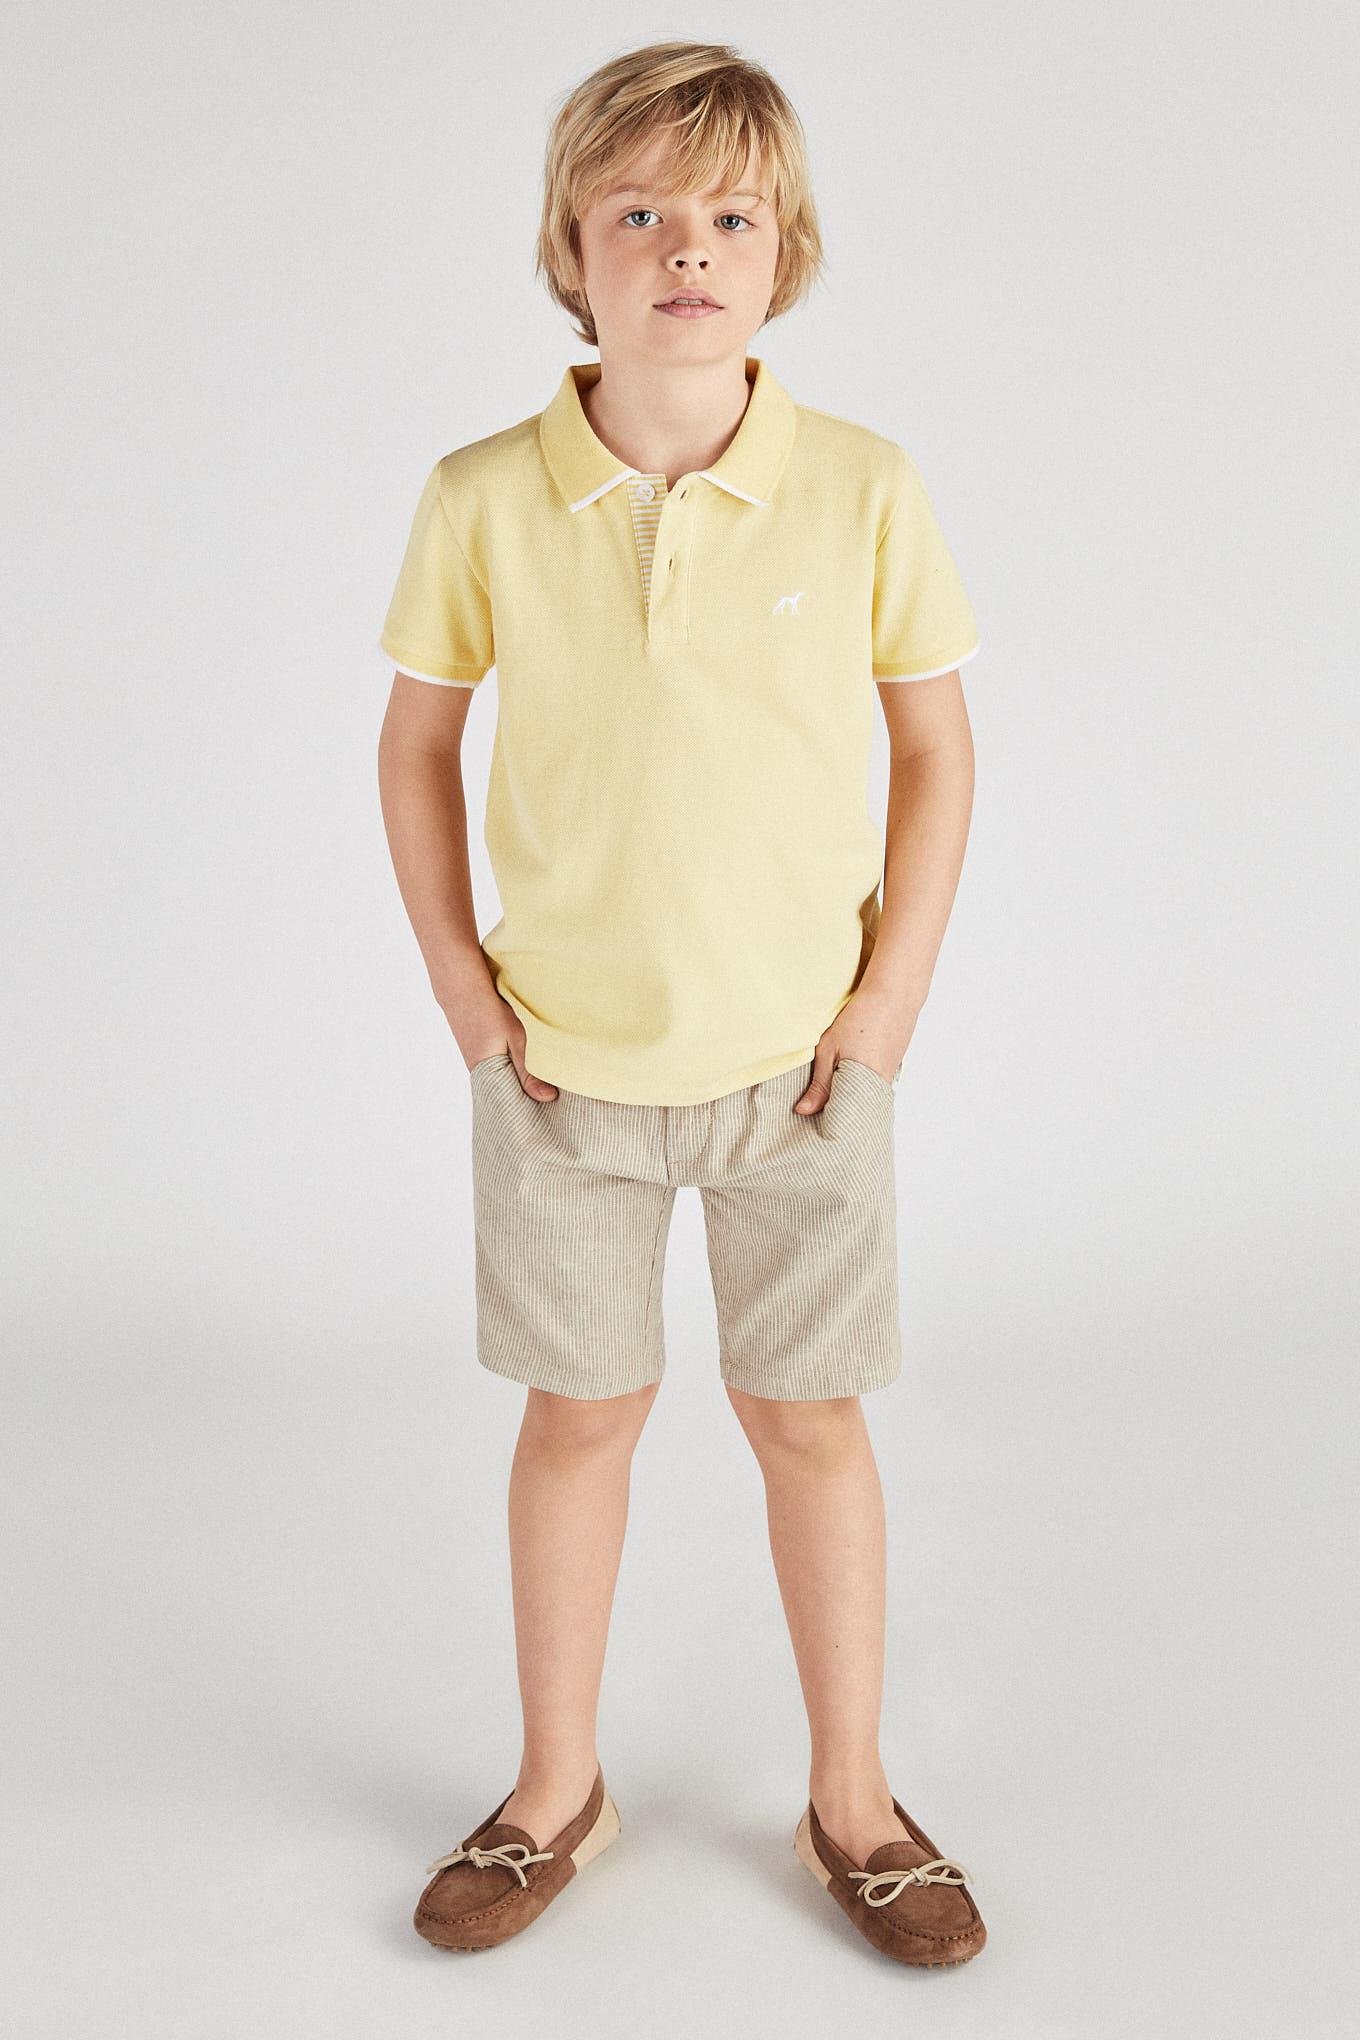 Bermuda Stone Casual Boy